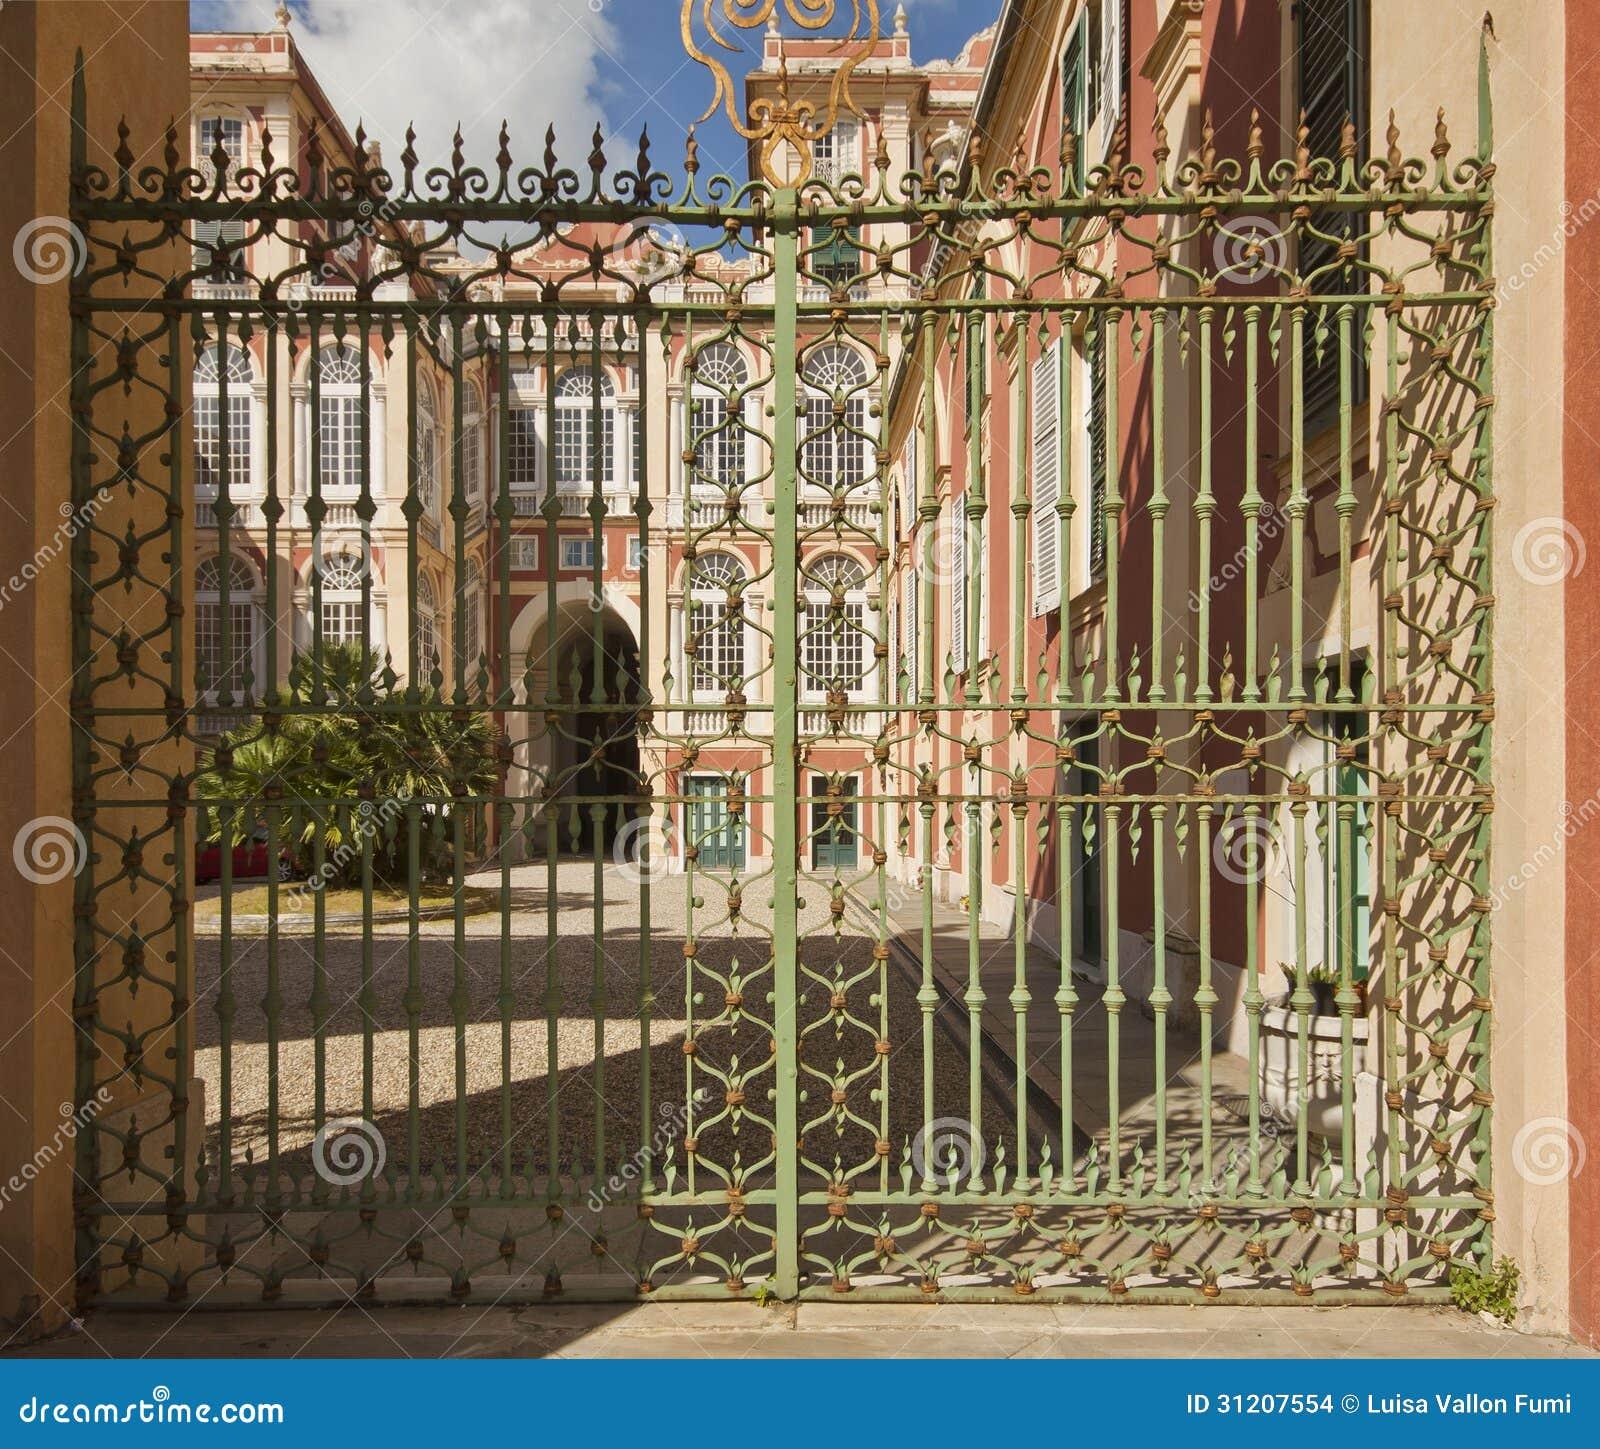 Genoa, Italy - Royal Palace, View Fron The Garden Gate Stock Photo ...